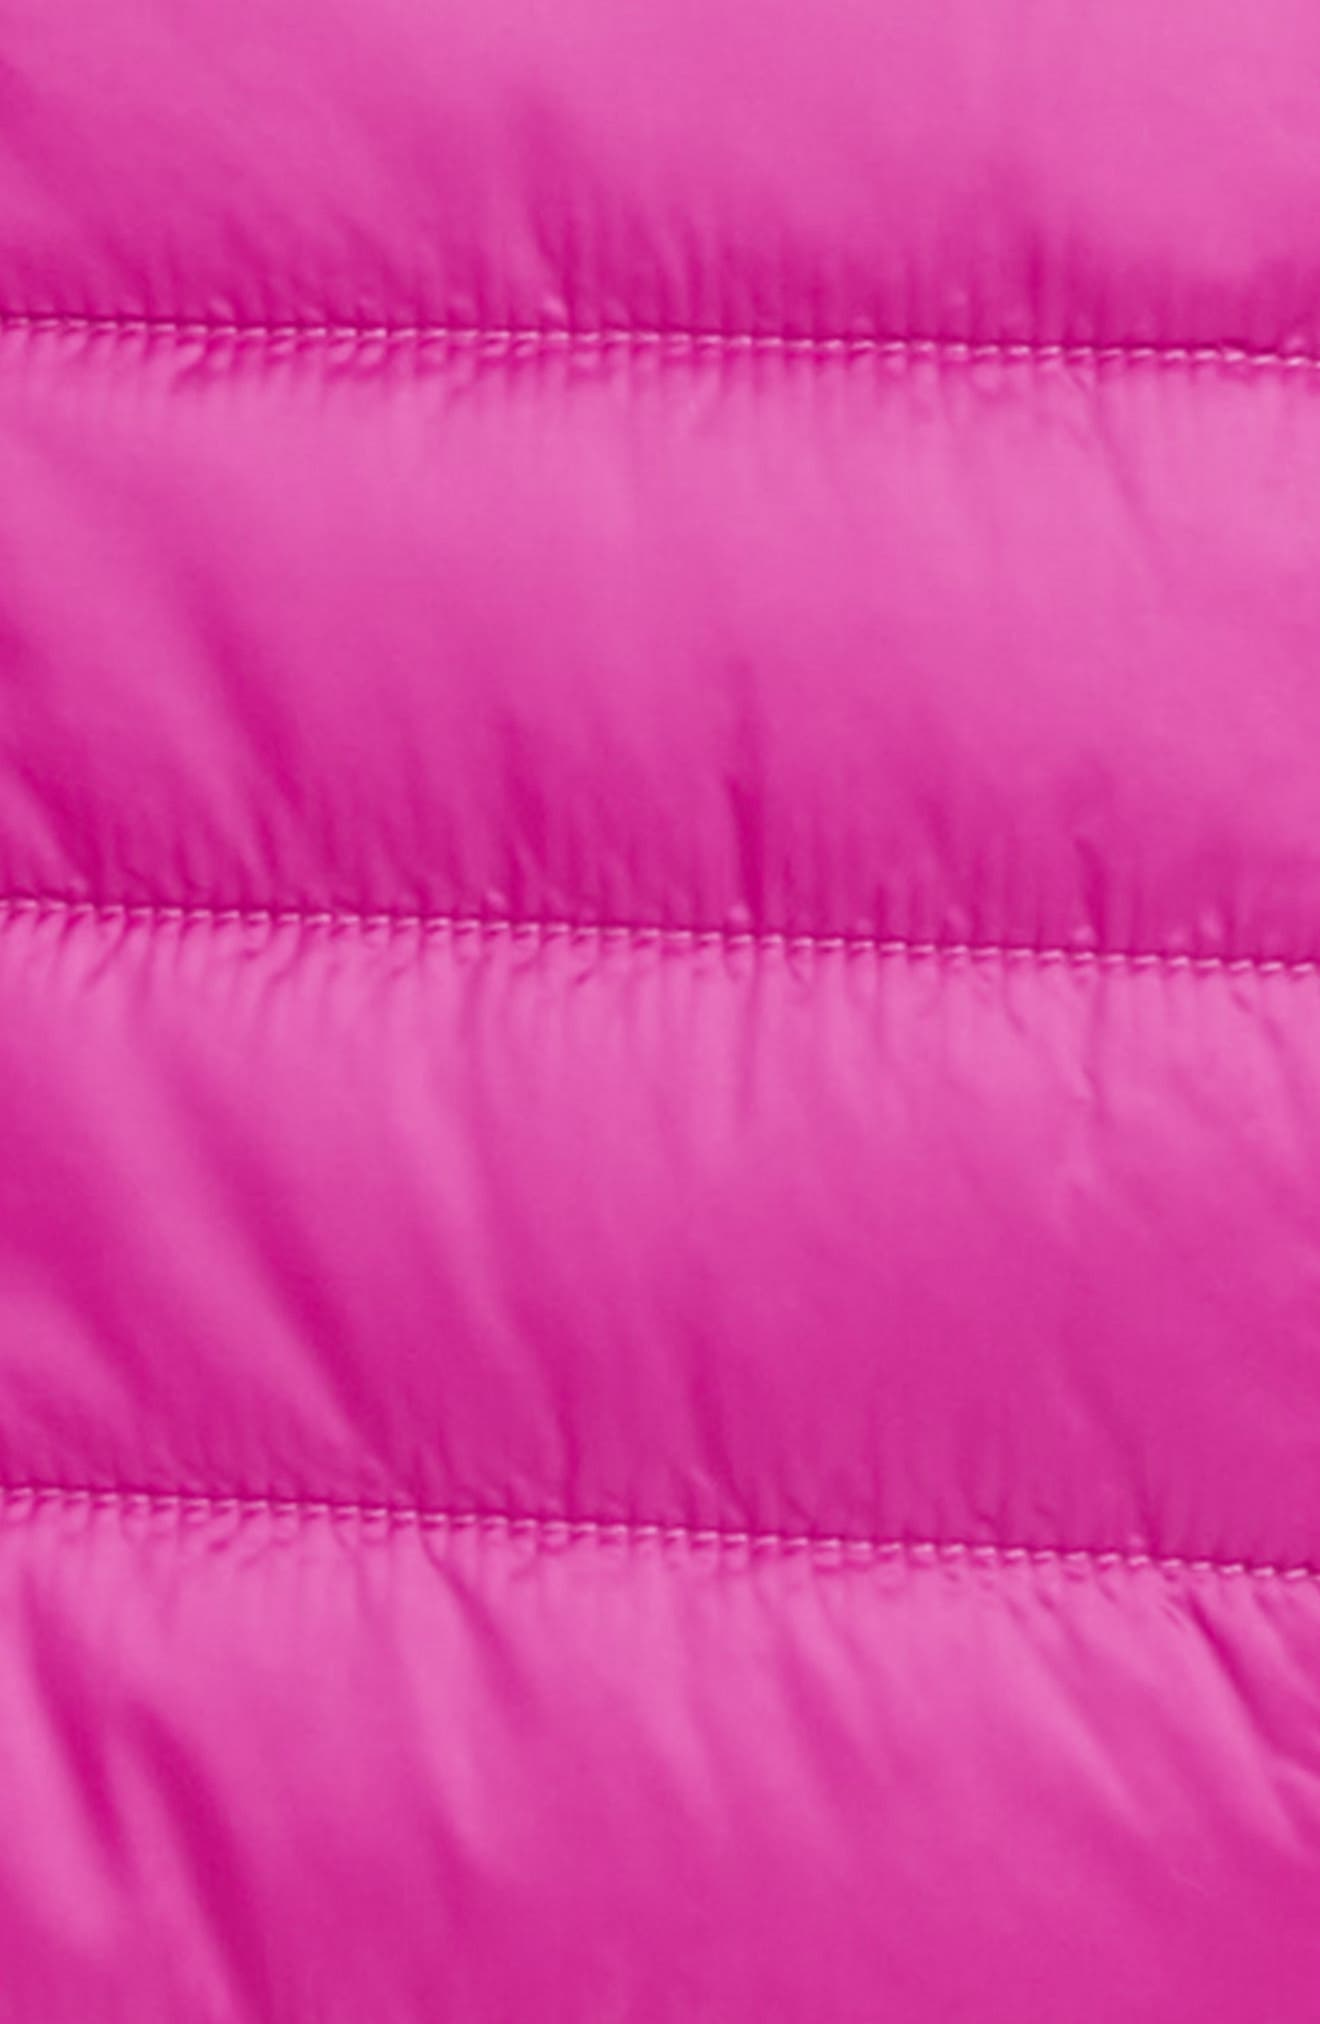 Mossbud Swirl Insulated Reversible Jacket,                             Alternate thumbnail 3, color,                             AZALEA PINK/ DRAMATIC PLUM